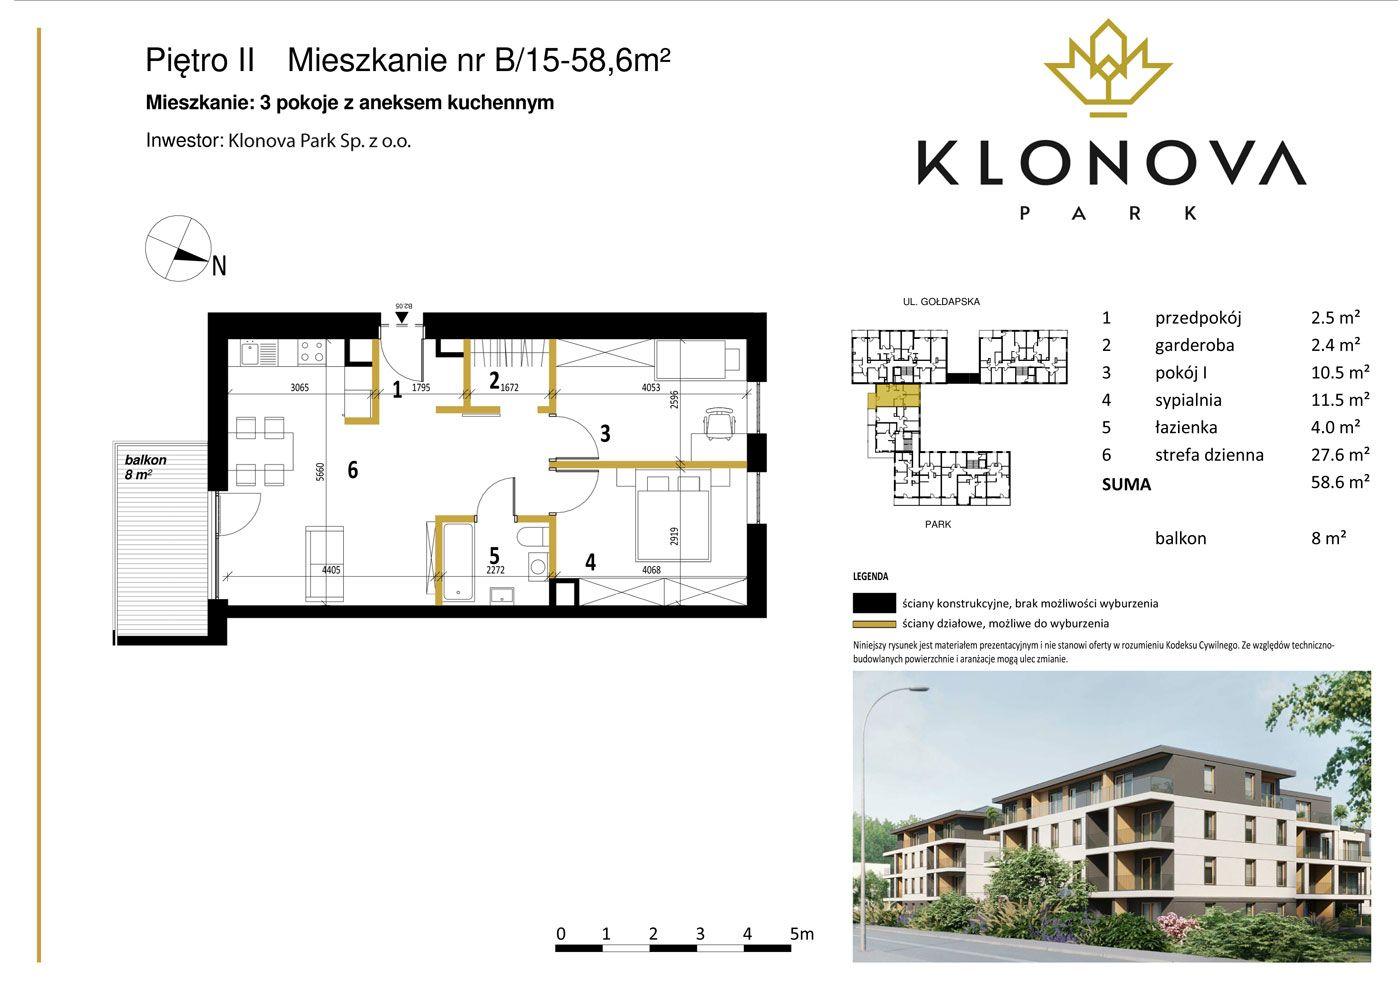 Apartamenty Klonova Park - Plan mieszkania B/15